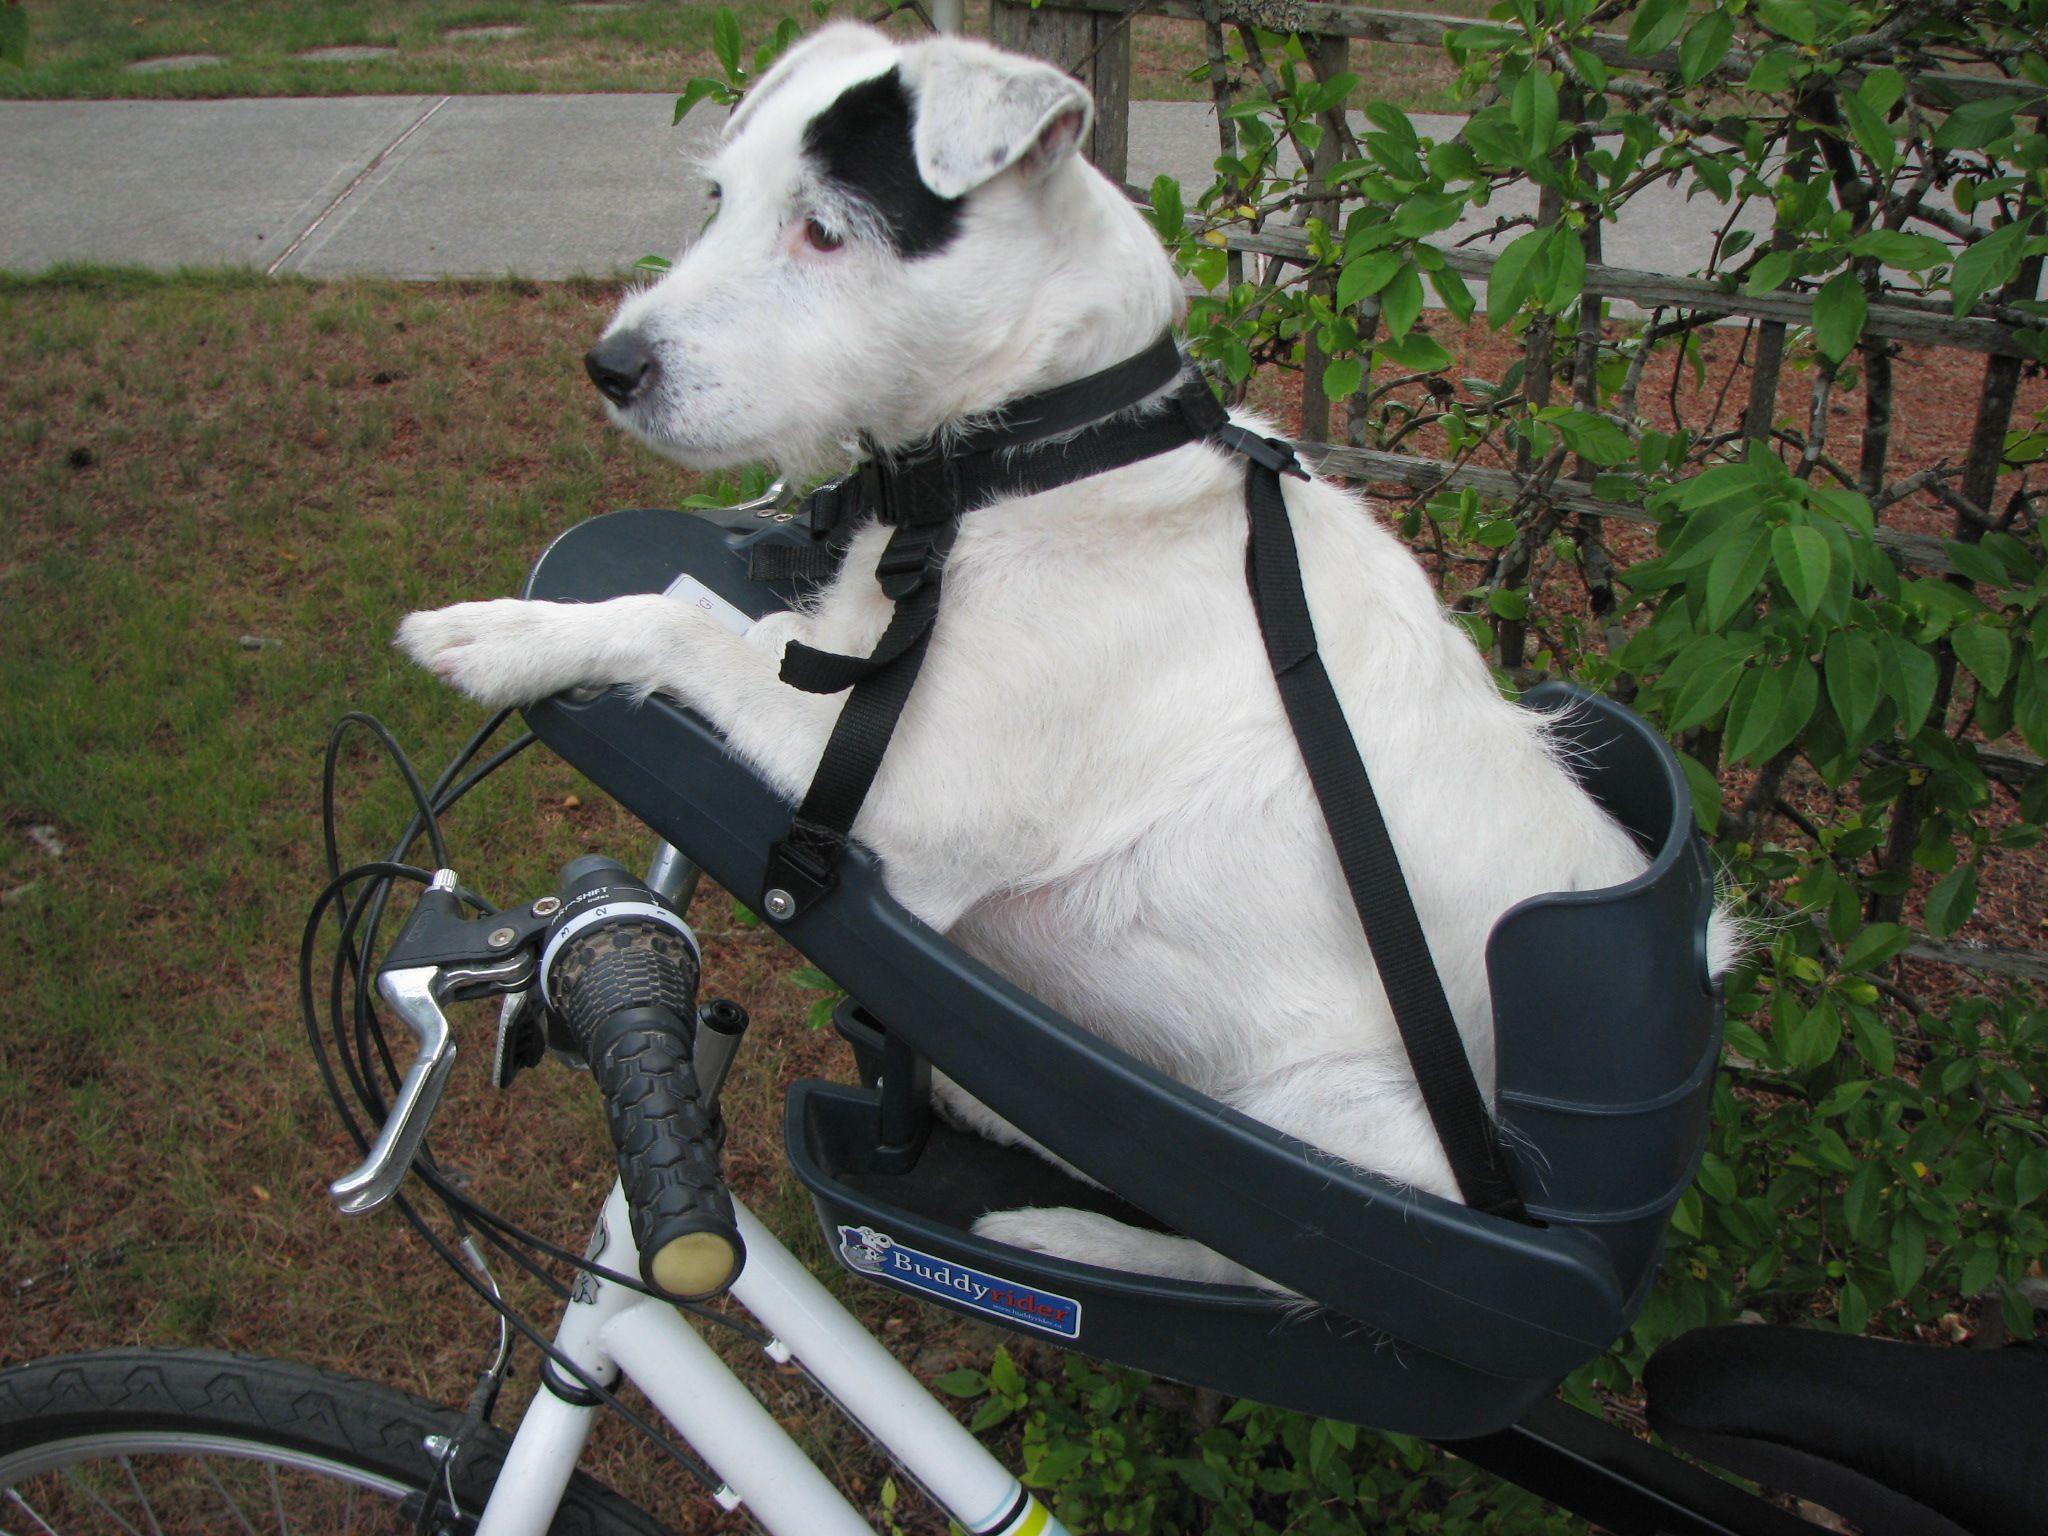 Puppy delivery service canada